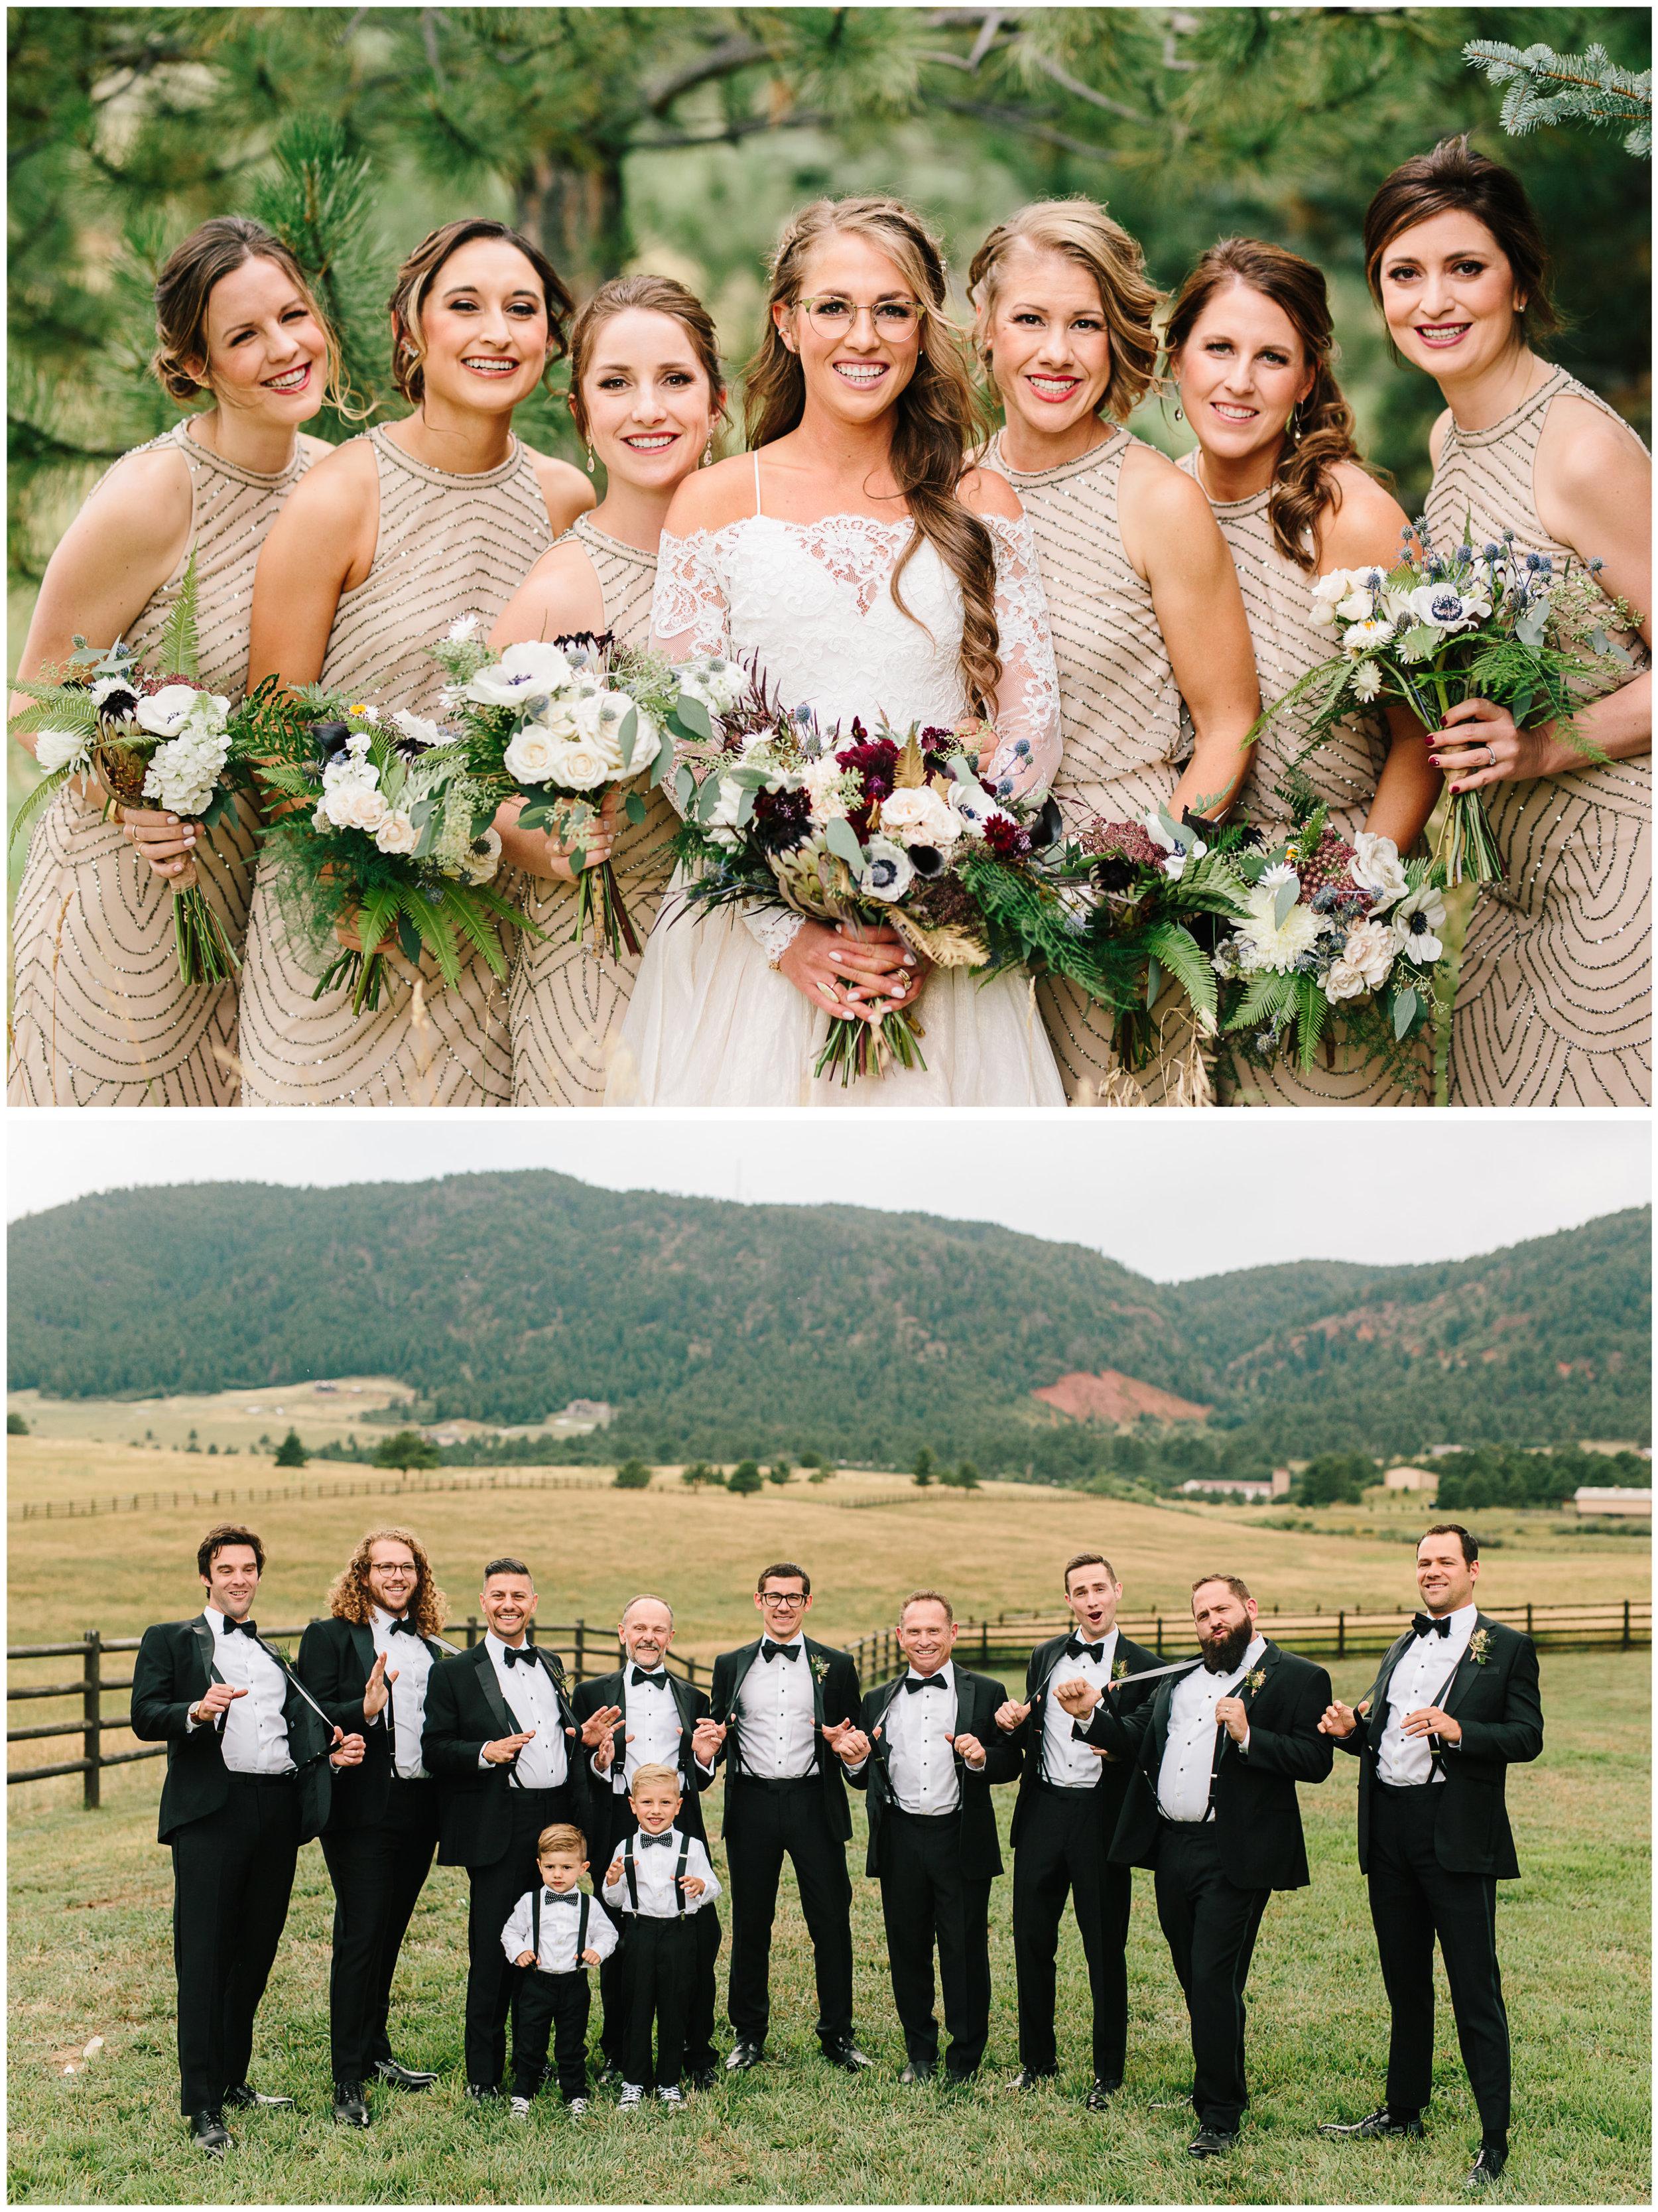 spruce_mountain_ranch_wedding_43.jpg